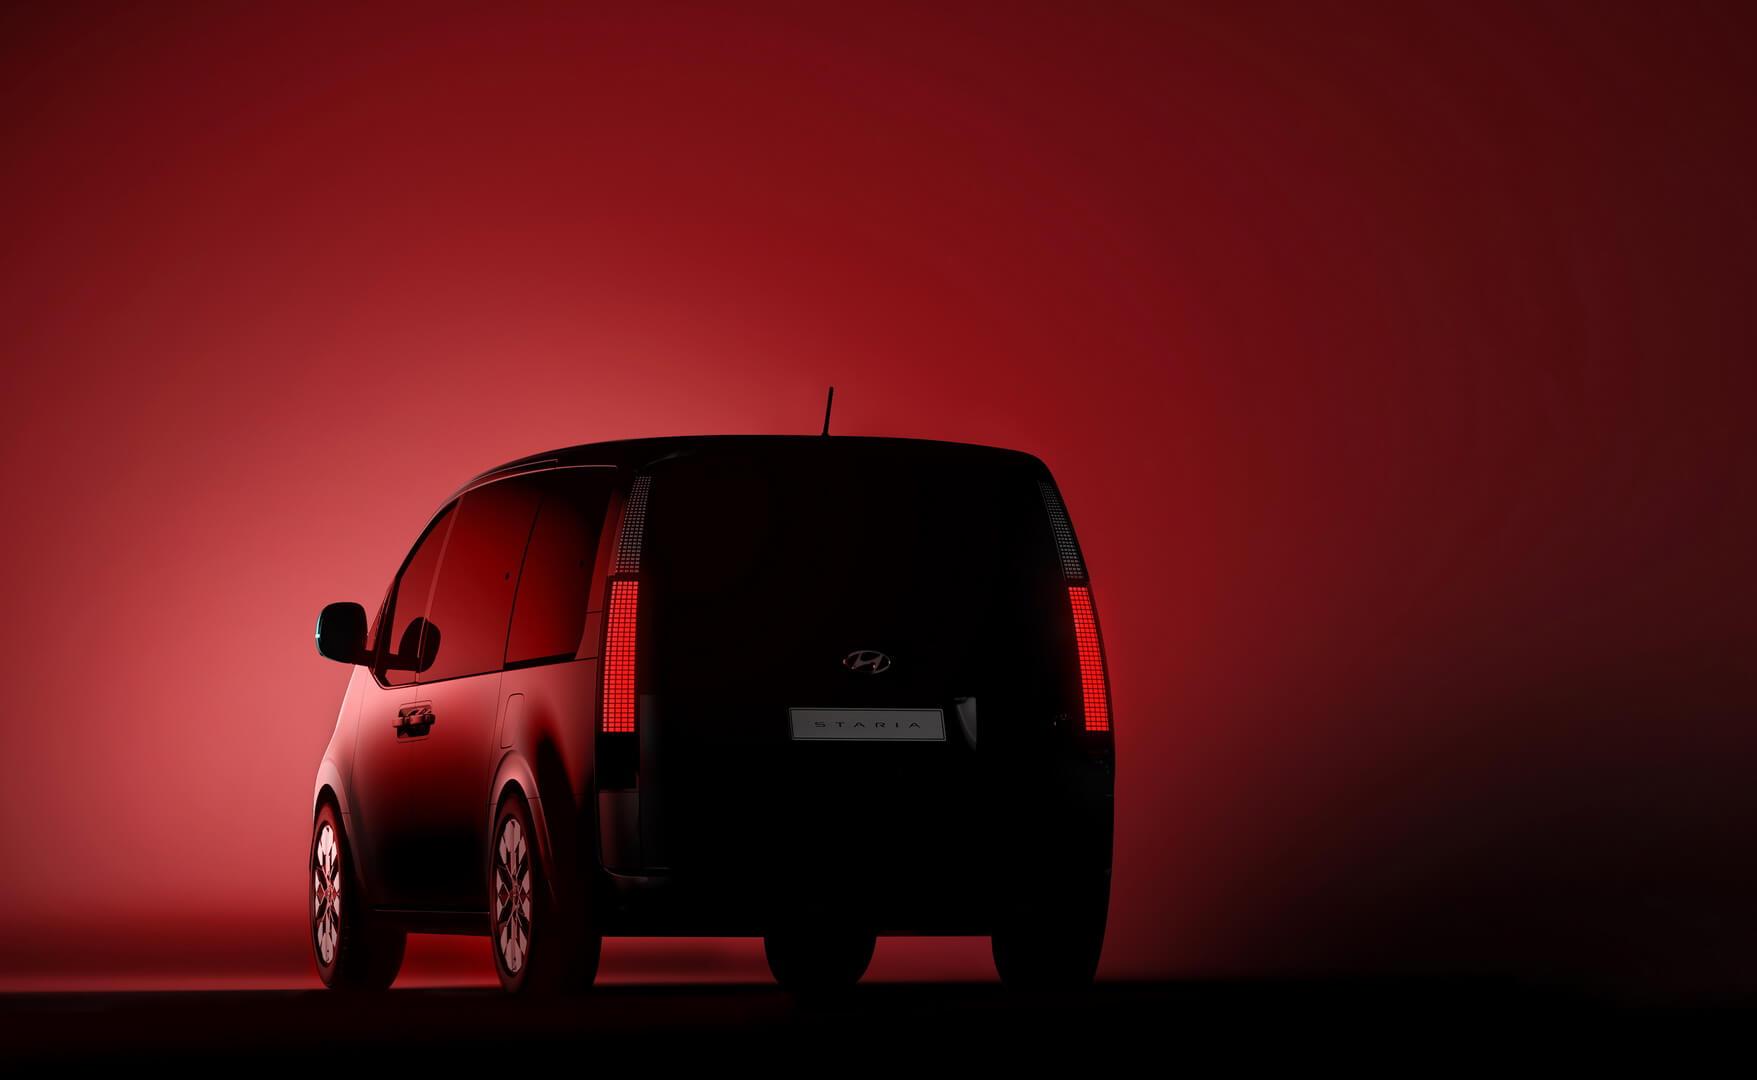 Hyundai STARIA с футуристическими элементами дизайна